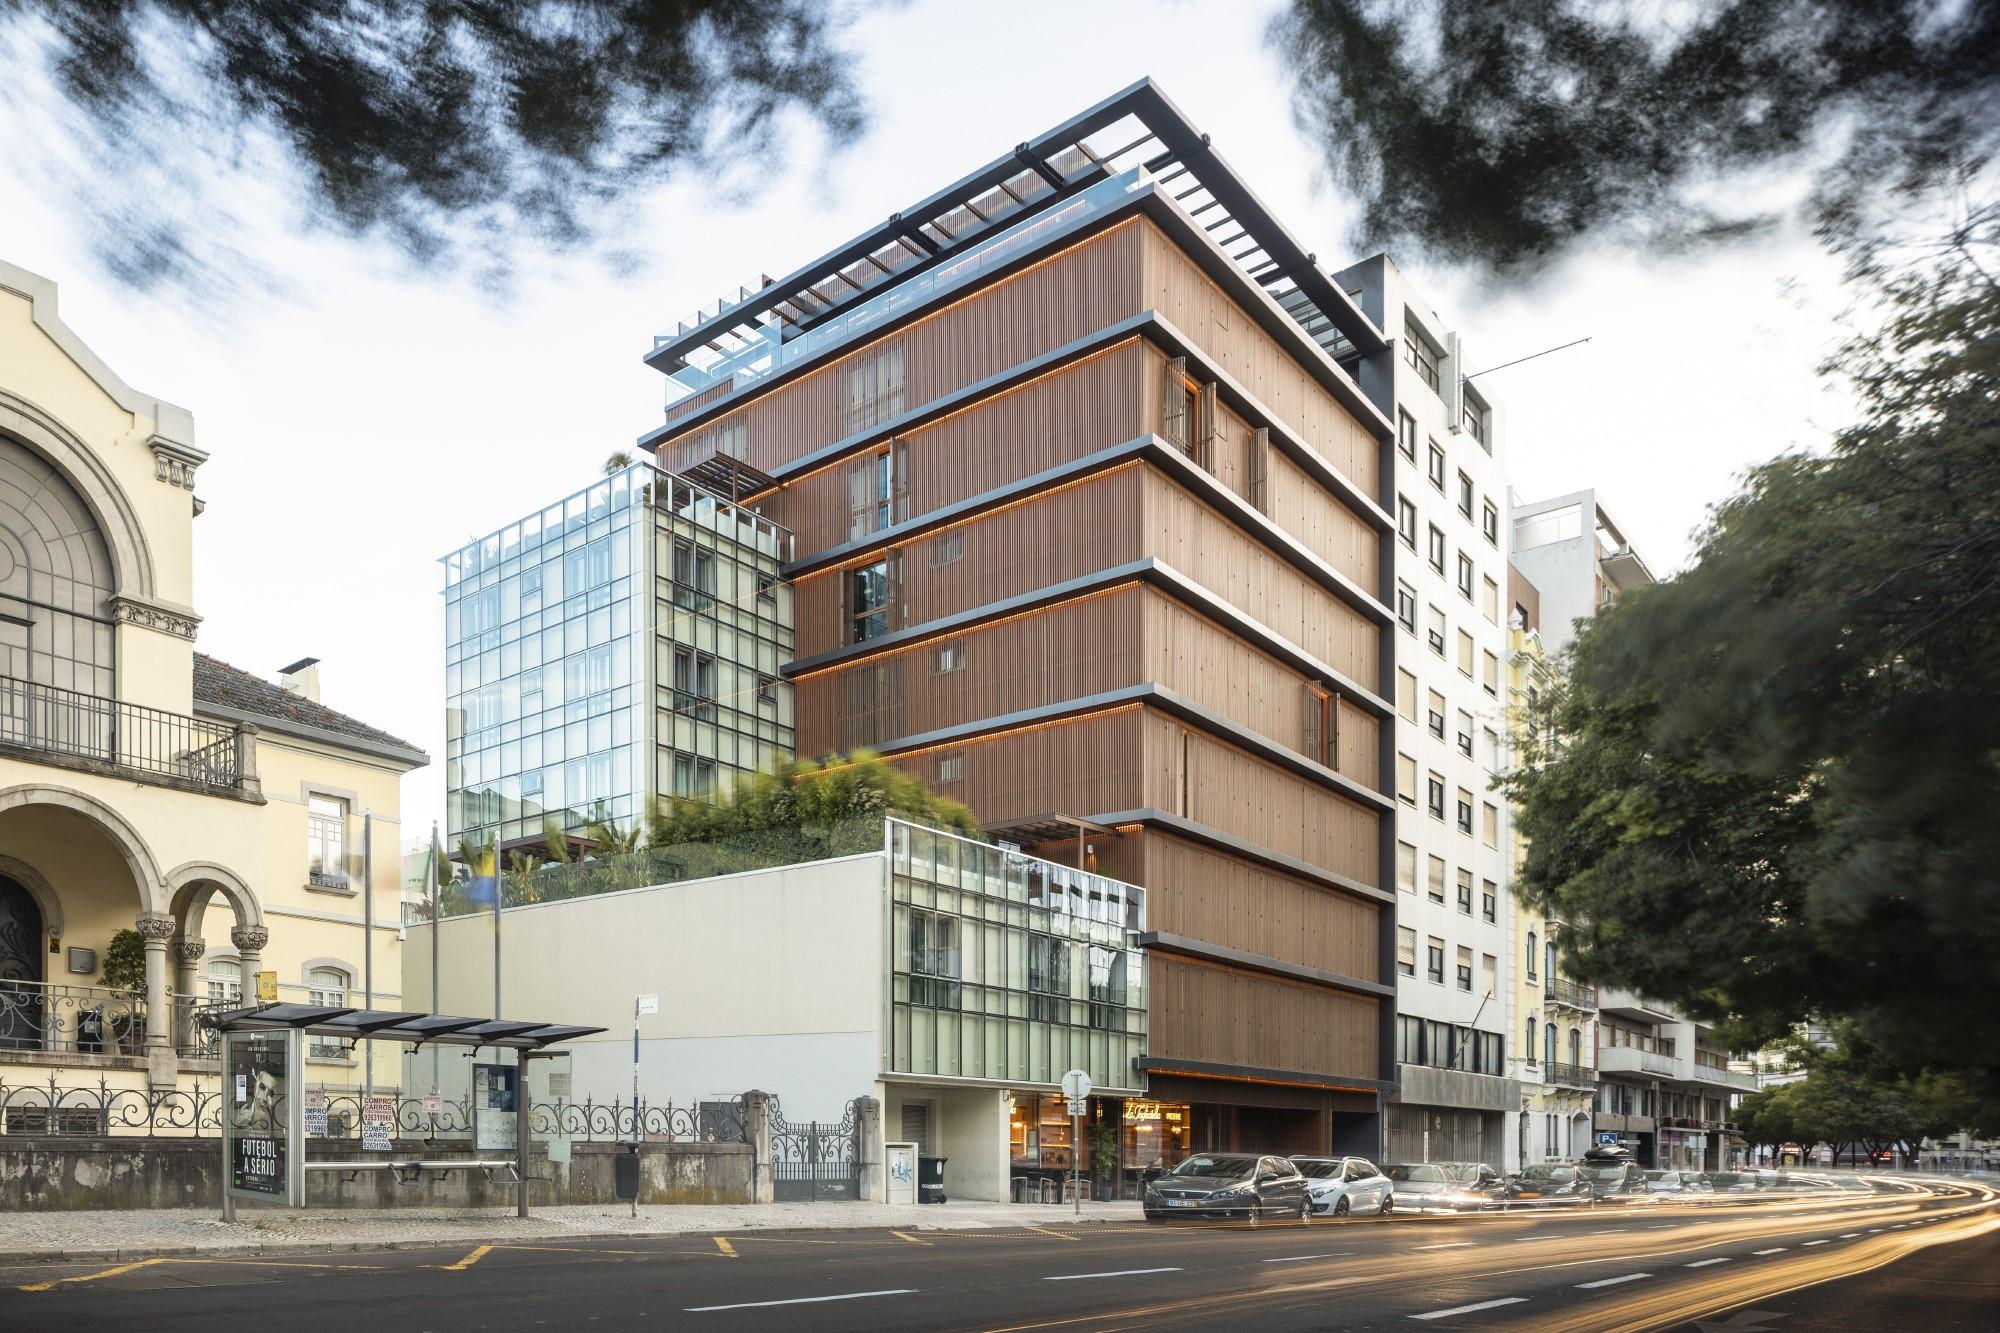 Nouveau Lisboa - já concluído / Major Development